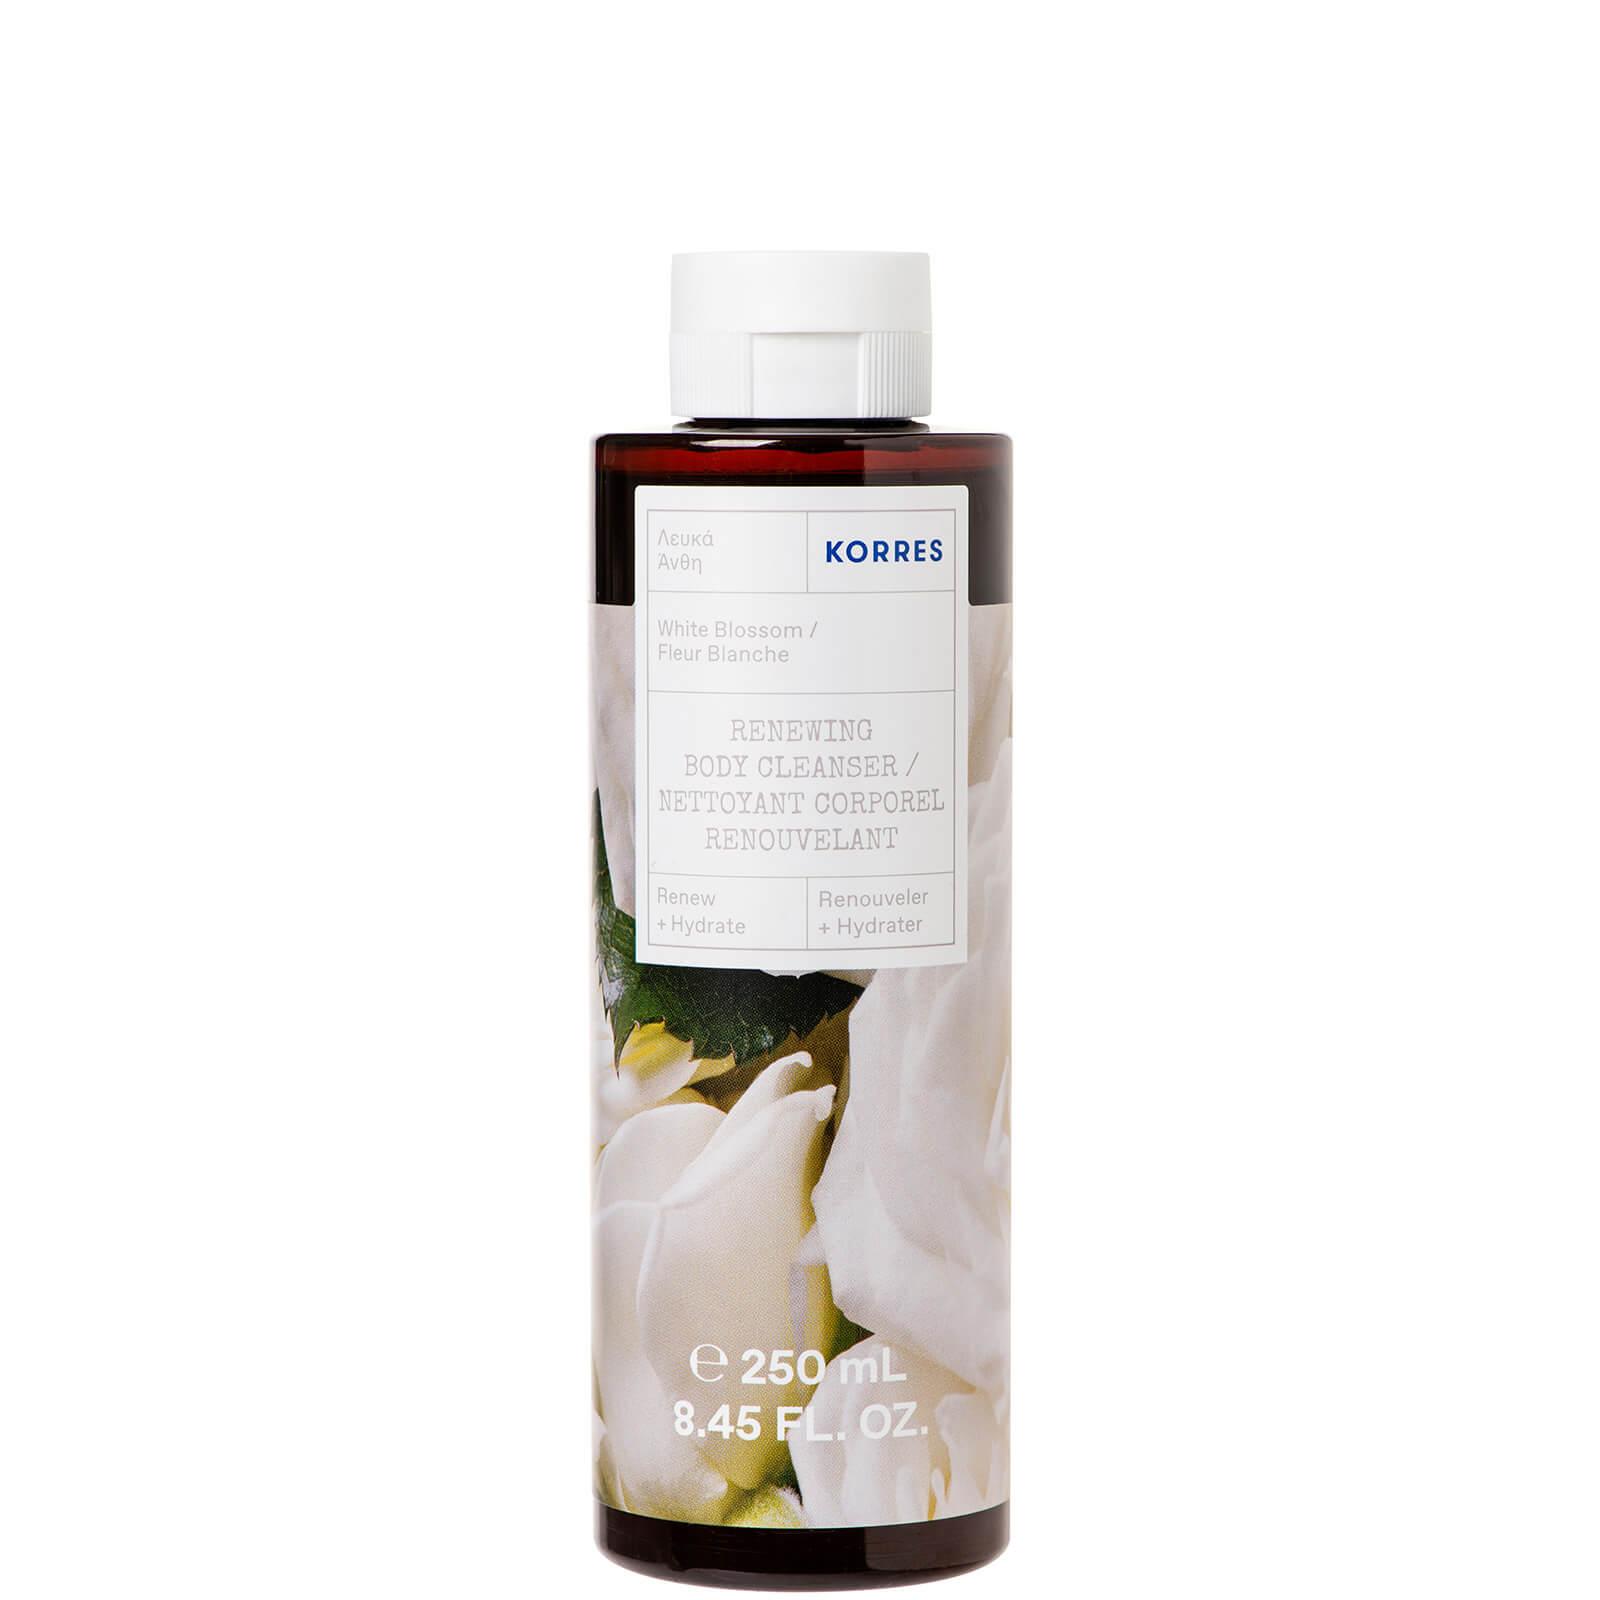 Купить KORRES White Blossom Renewing Body Cleanser 250ml очищающее средство для тела